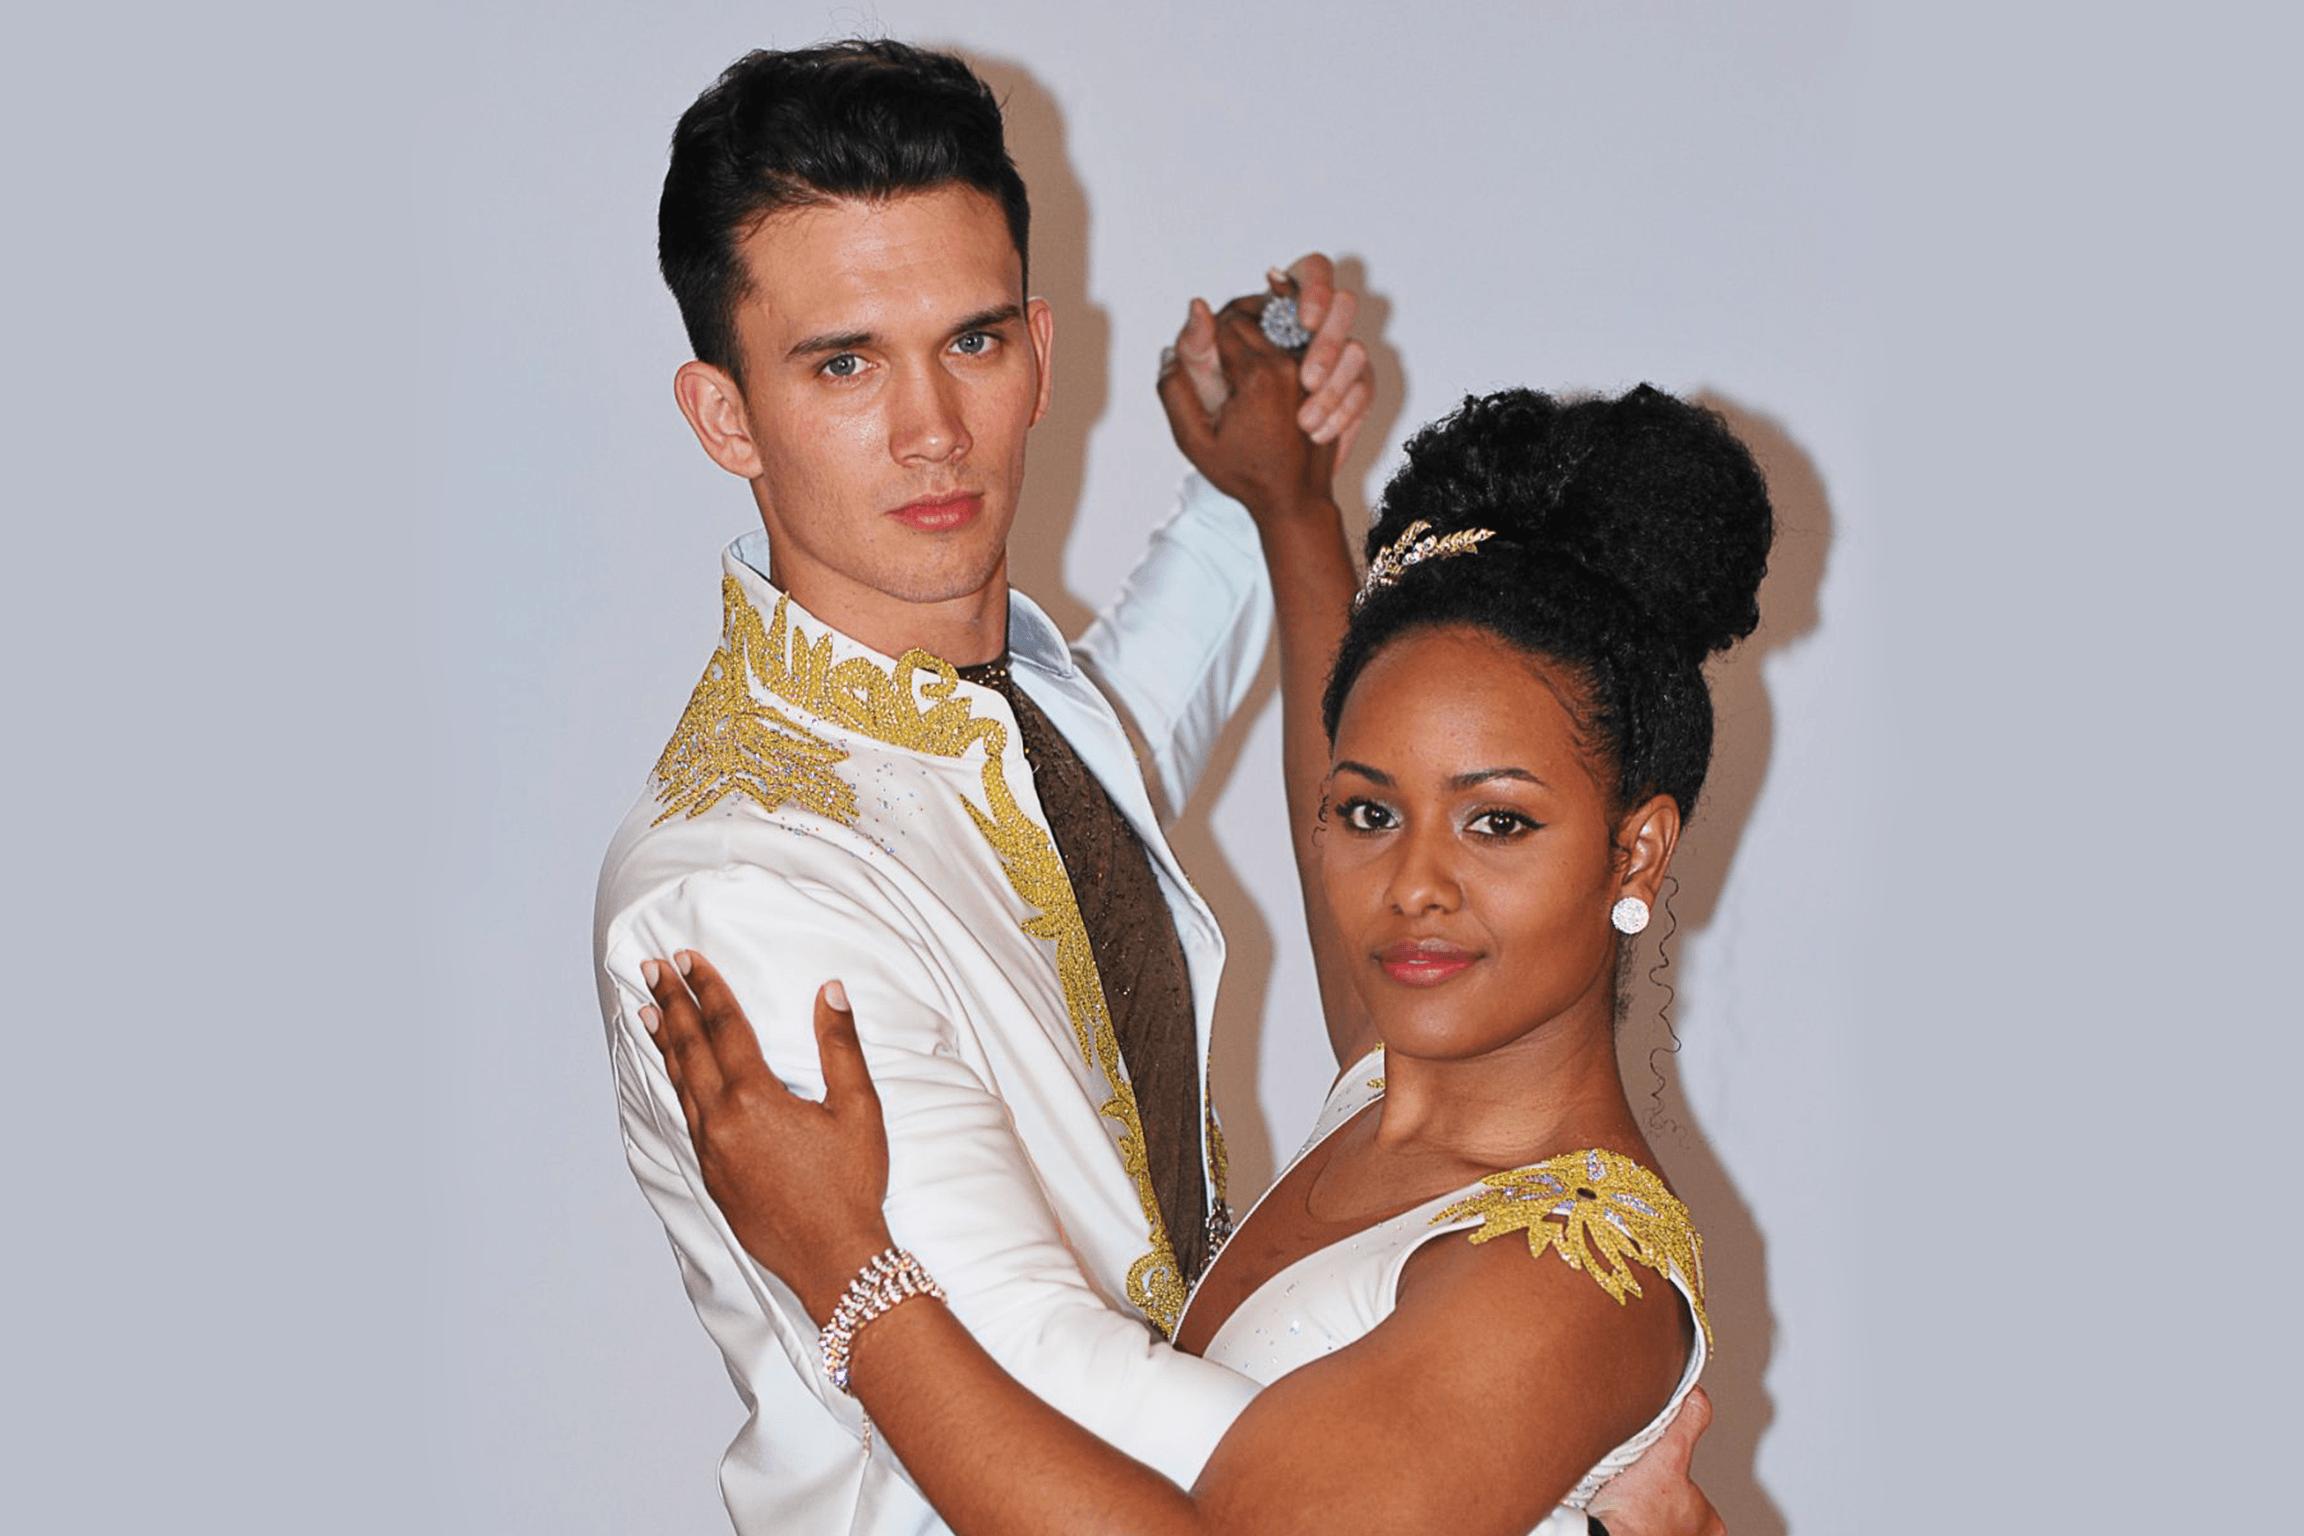 Sueco & Johanna || Dancers Profile